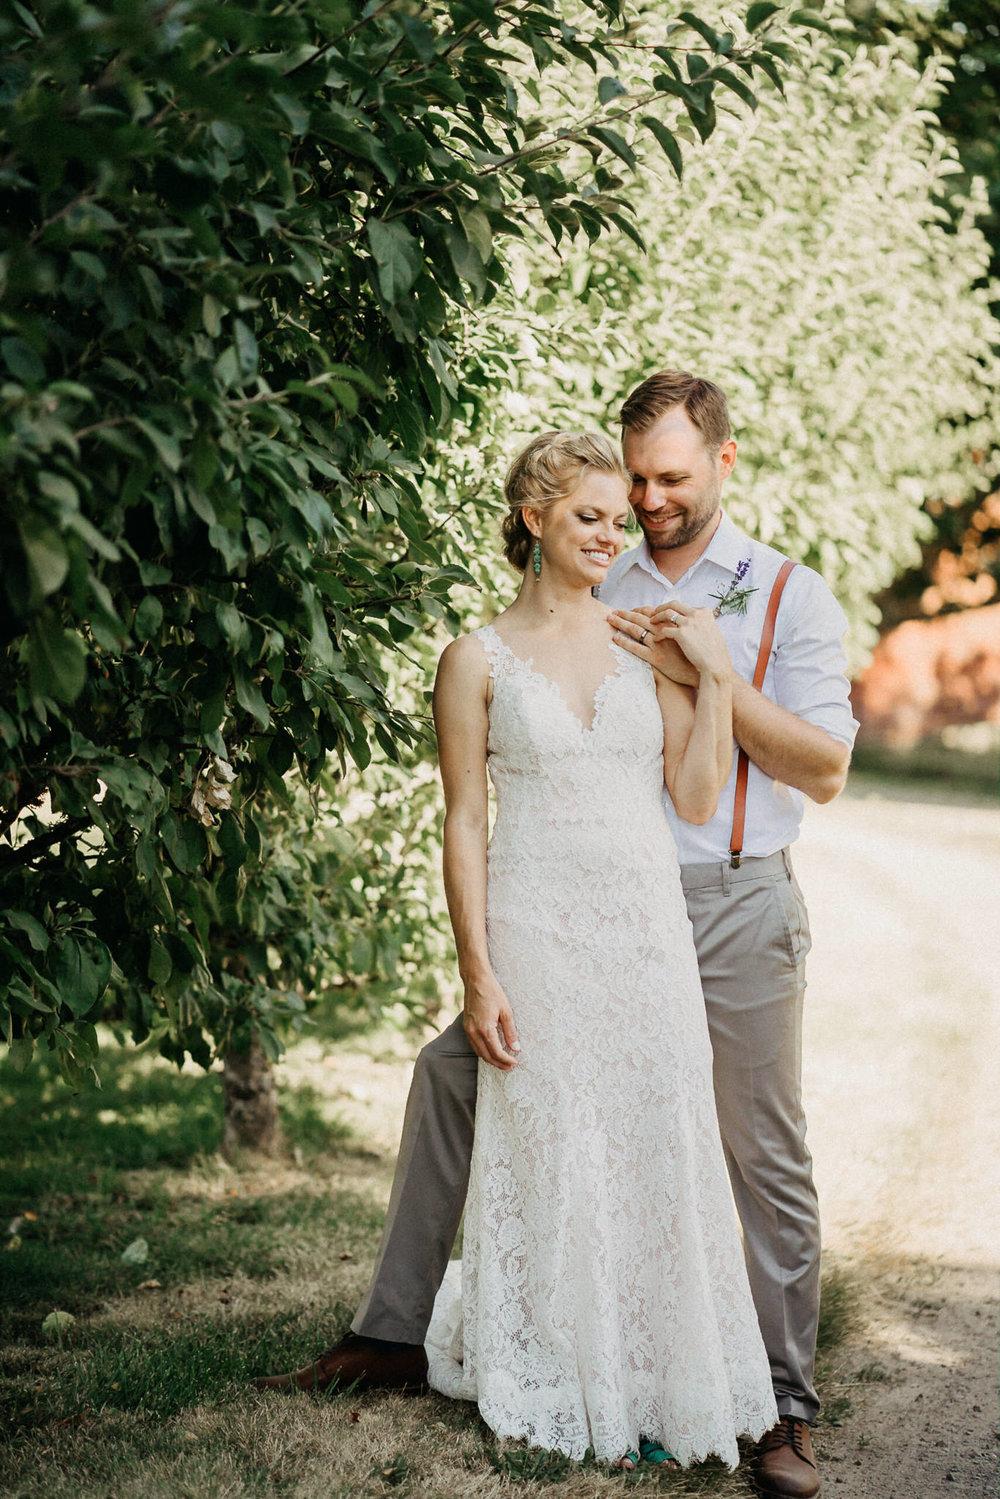 Summerhill-Farms-Portland-Wedding-Photographer-Backyard-Vineyard-60.jpg